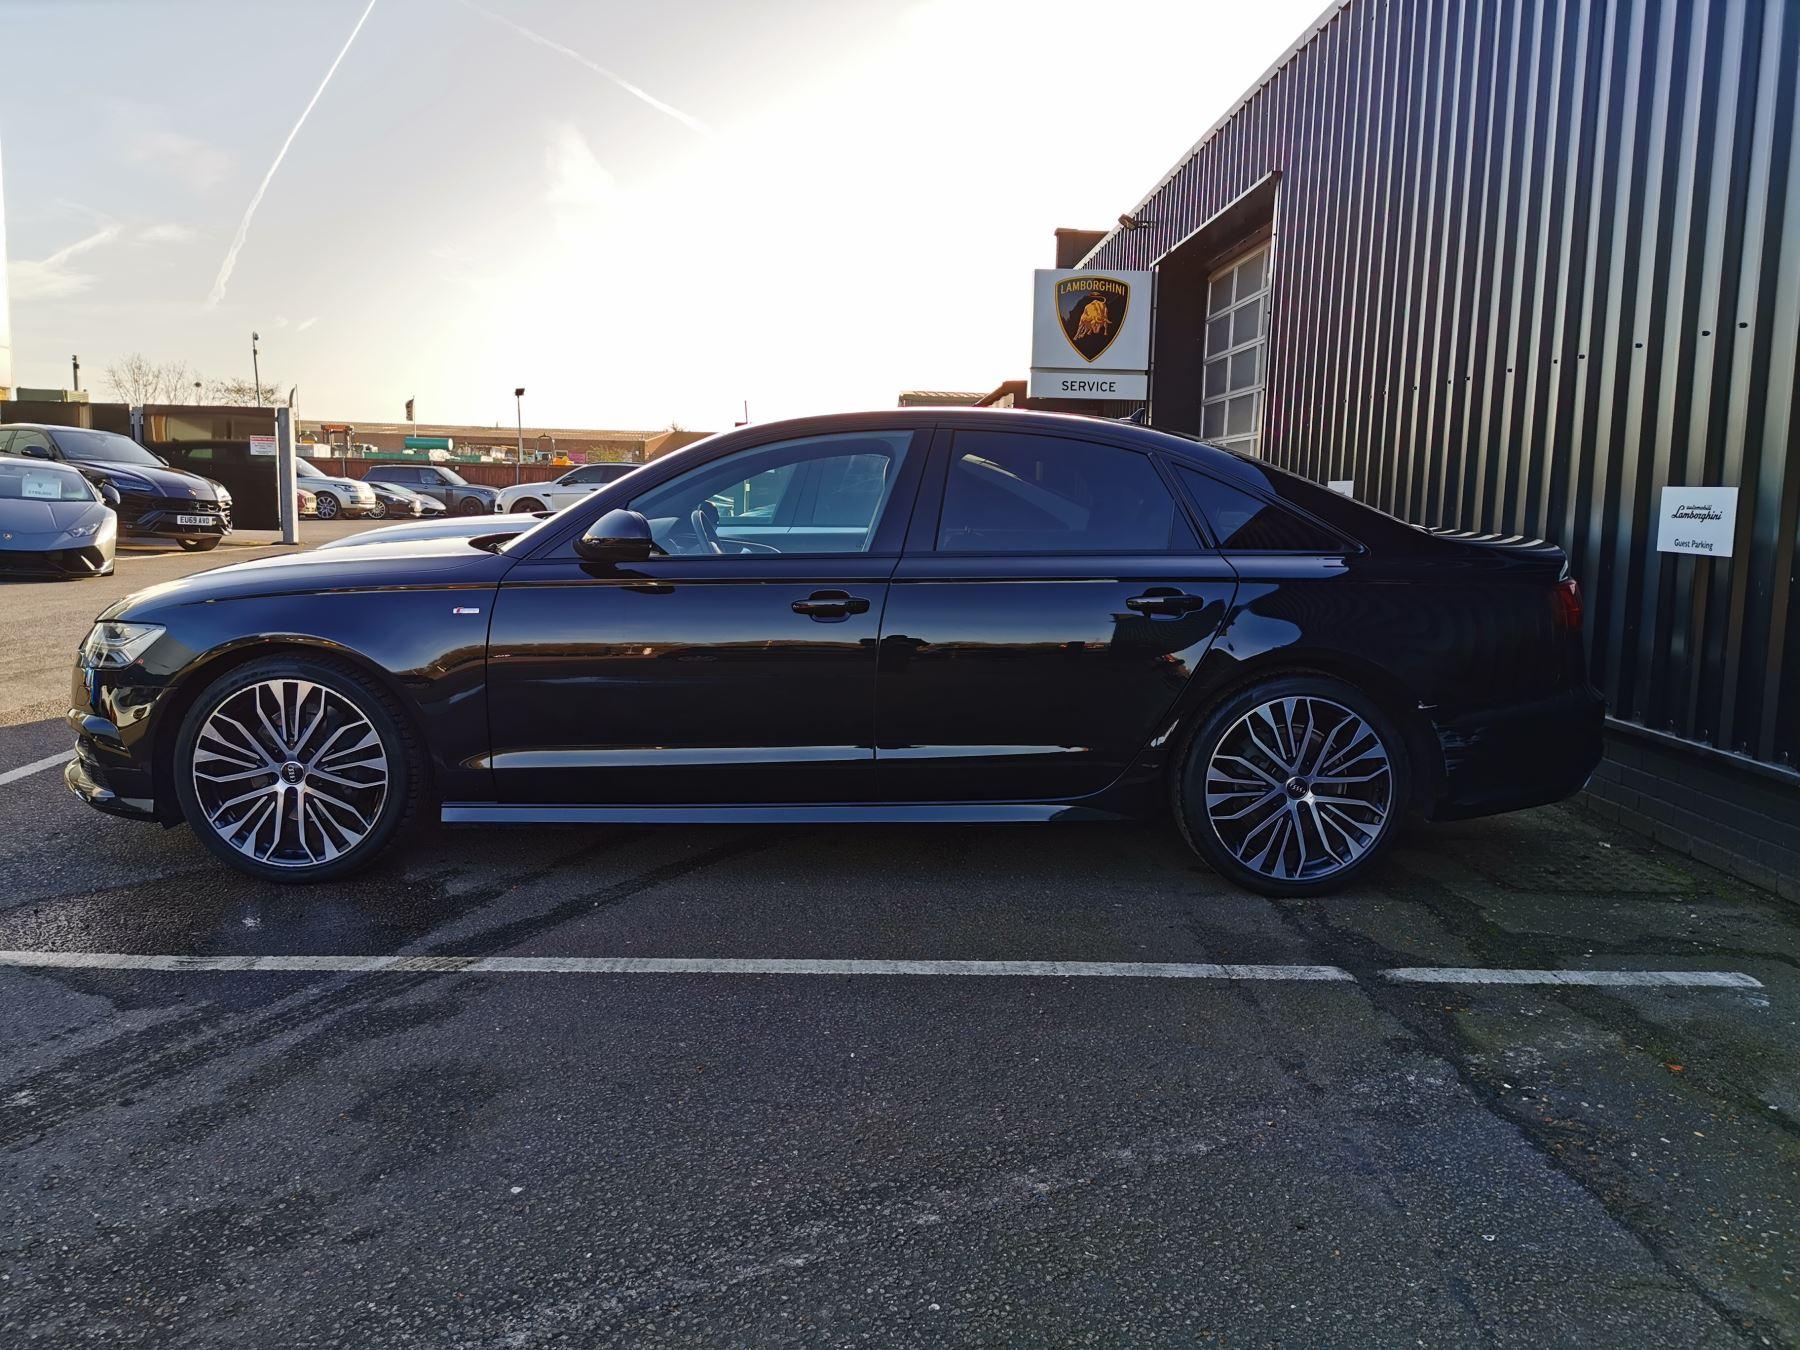 Audi A6 2.0 TDI Ultra Black Edition S Tronic image 3